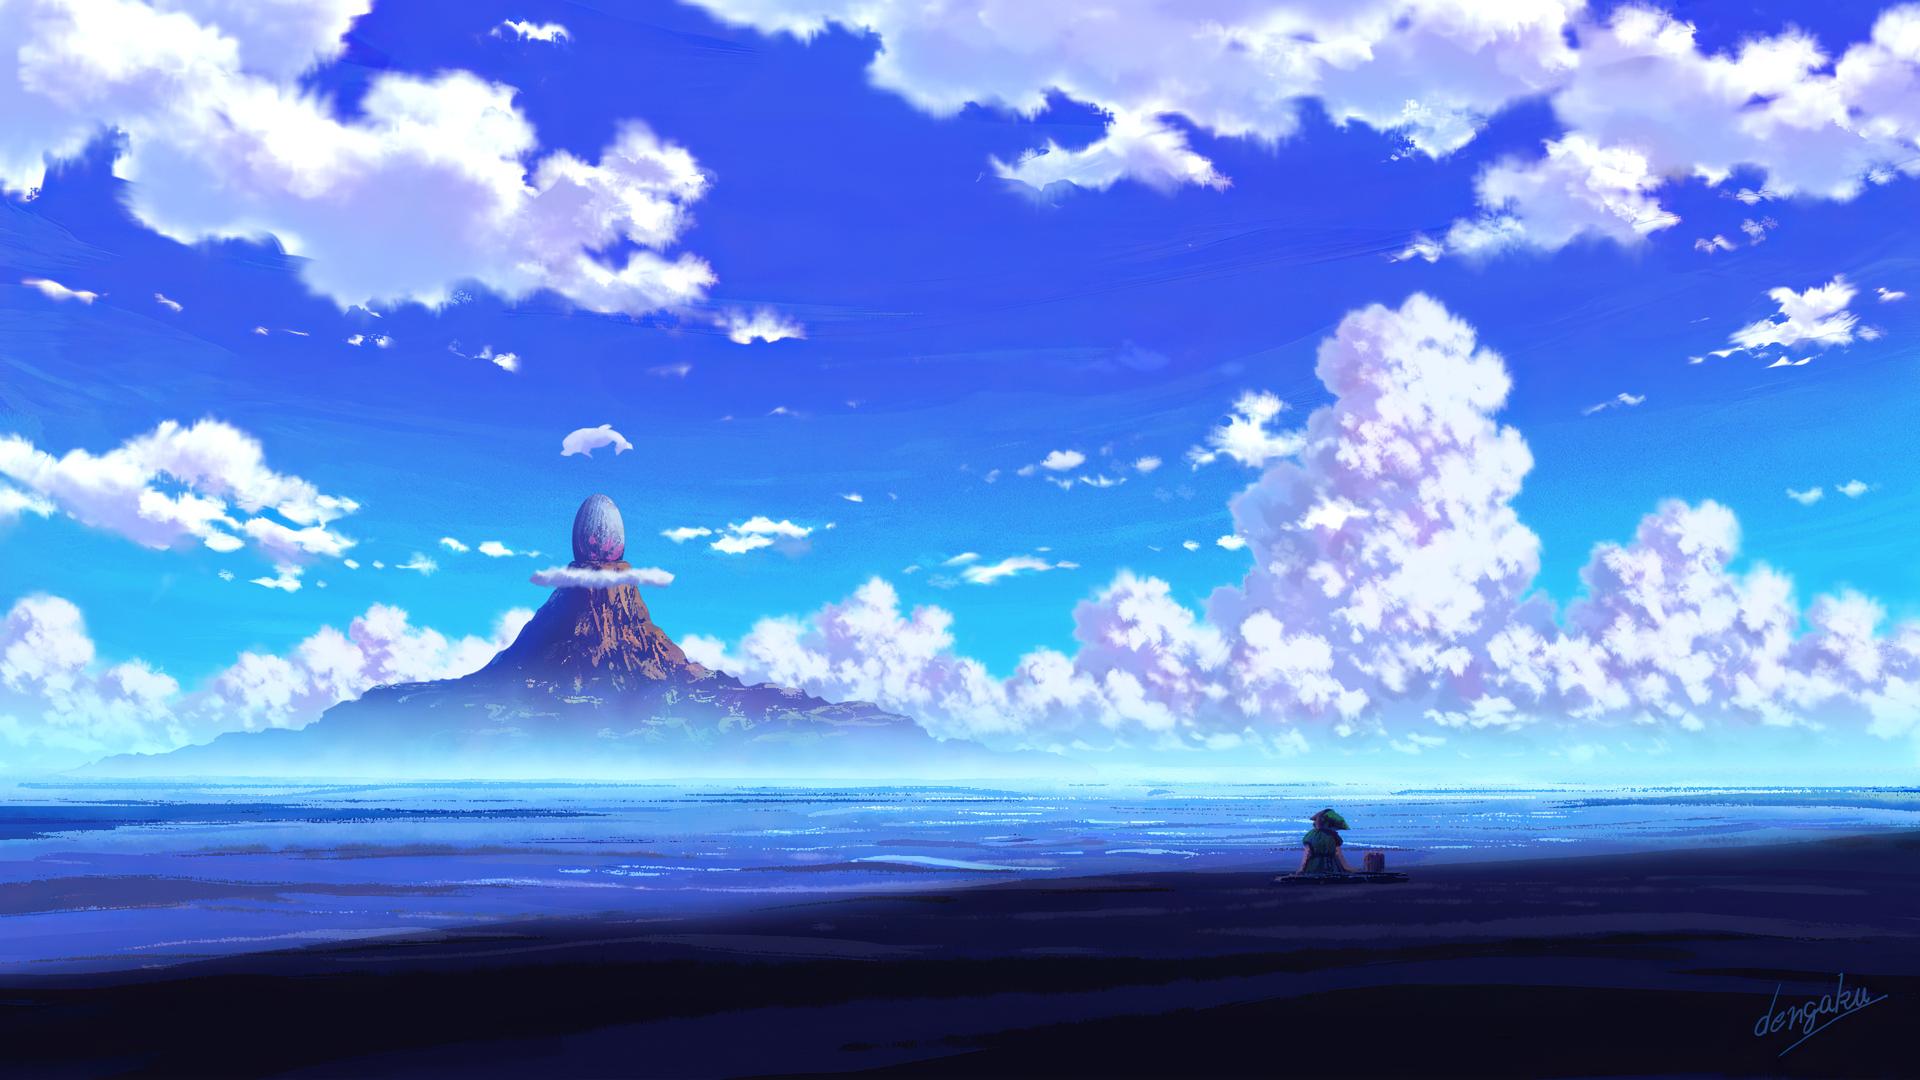 1920x1080 Anime Scenery Sitting 4k Laptop Full HD 1080P HD ...